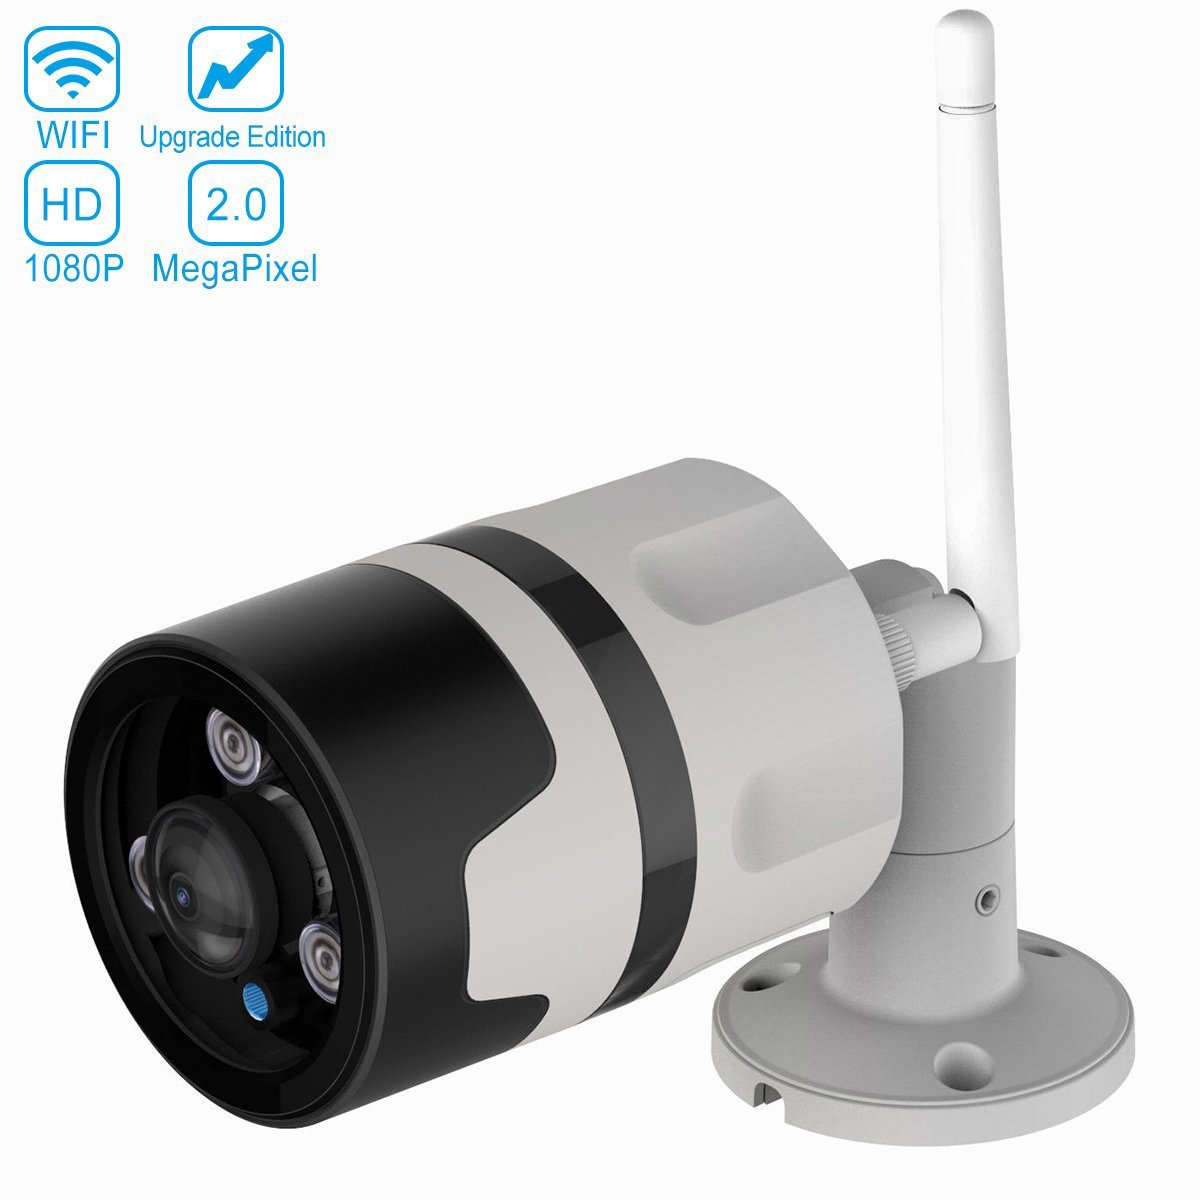 Vstarcam 無線防水 wifi カメラ 屋外カメラ 180°超広角カメラ 防犯カメラ 監視カメラ 1080P 200万高画素 WIFI HD 有線 無線 128G SDカード 15M夜間IP66 遠隔監視カメラ B07D4KVNMR